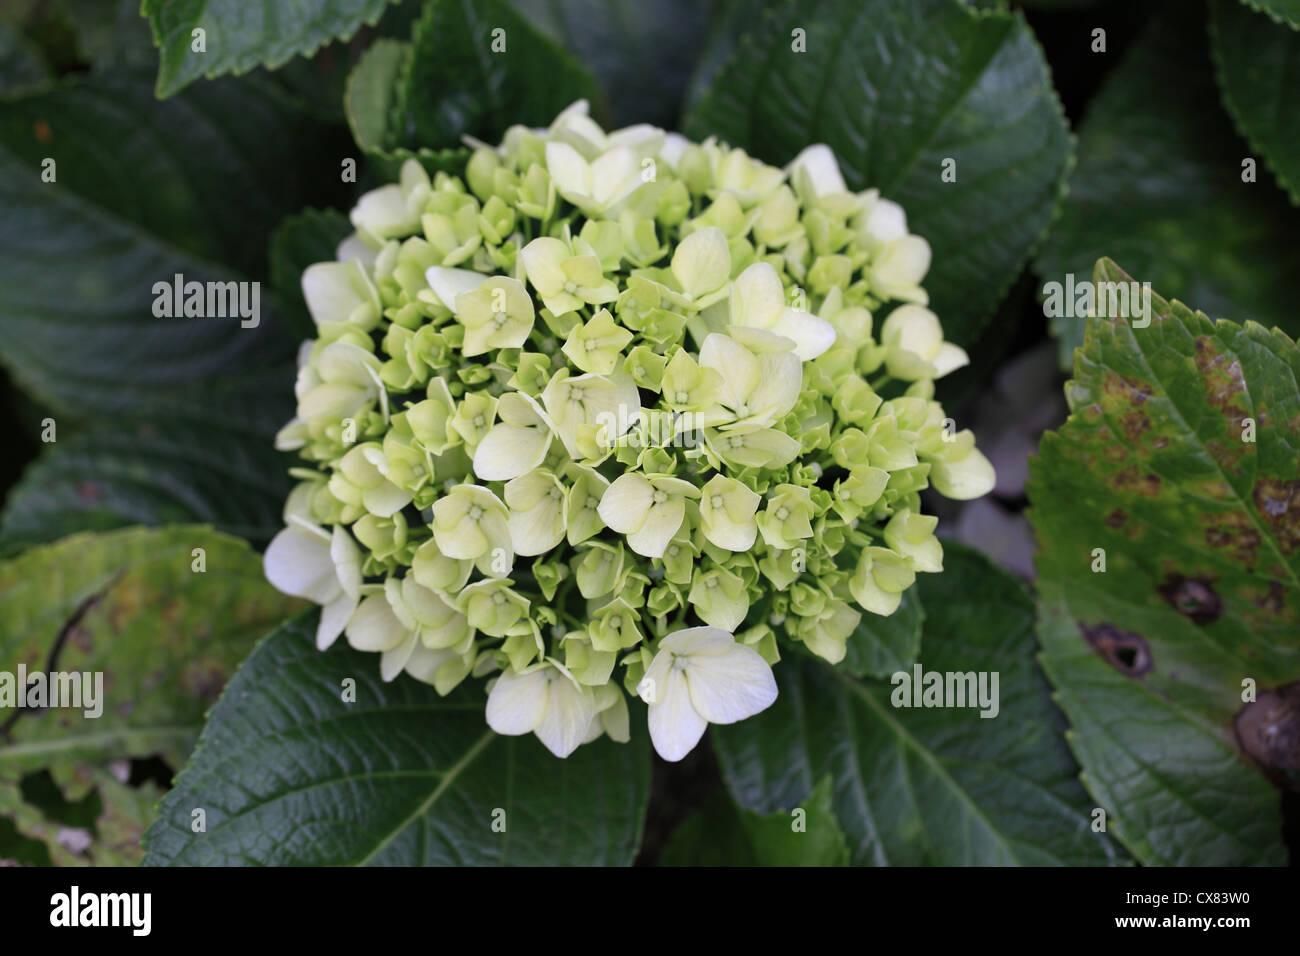 Bunch Of White Tiny Flowers Stock Photo 50580460 Alamy